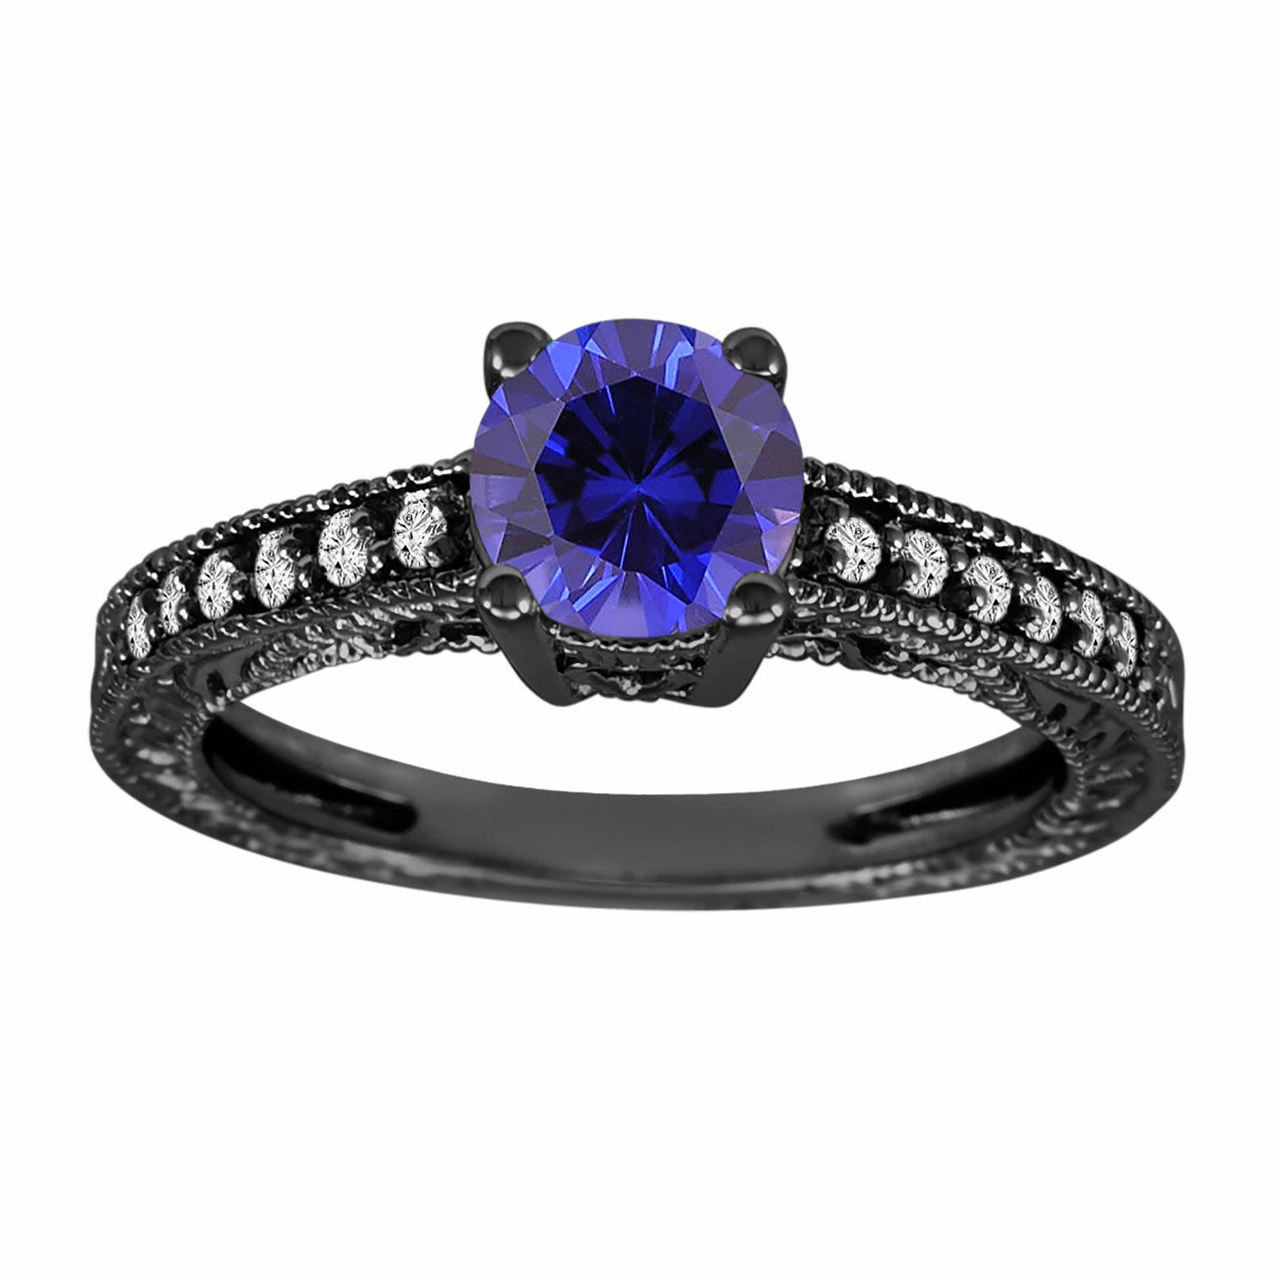 Blue Sapphire Amp Diamonds Engagement Ring Vintage Style 14k